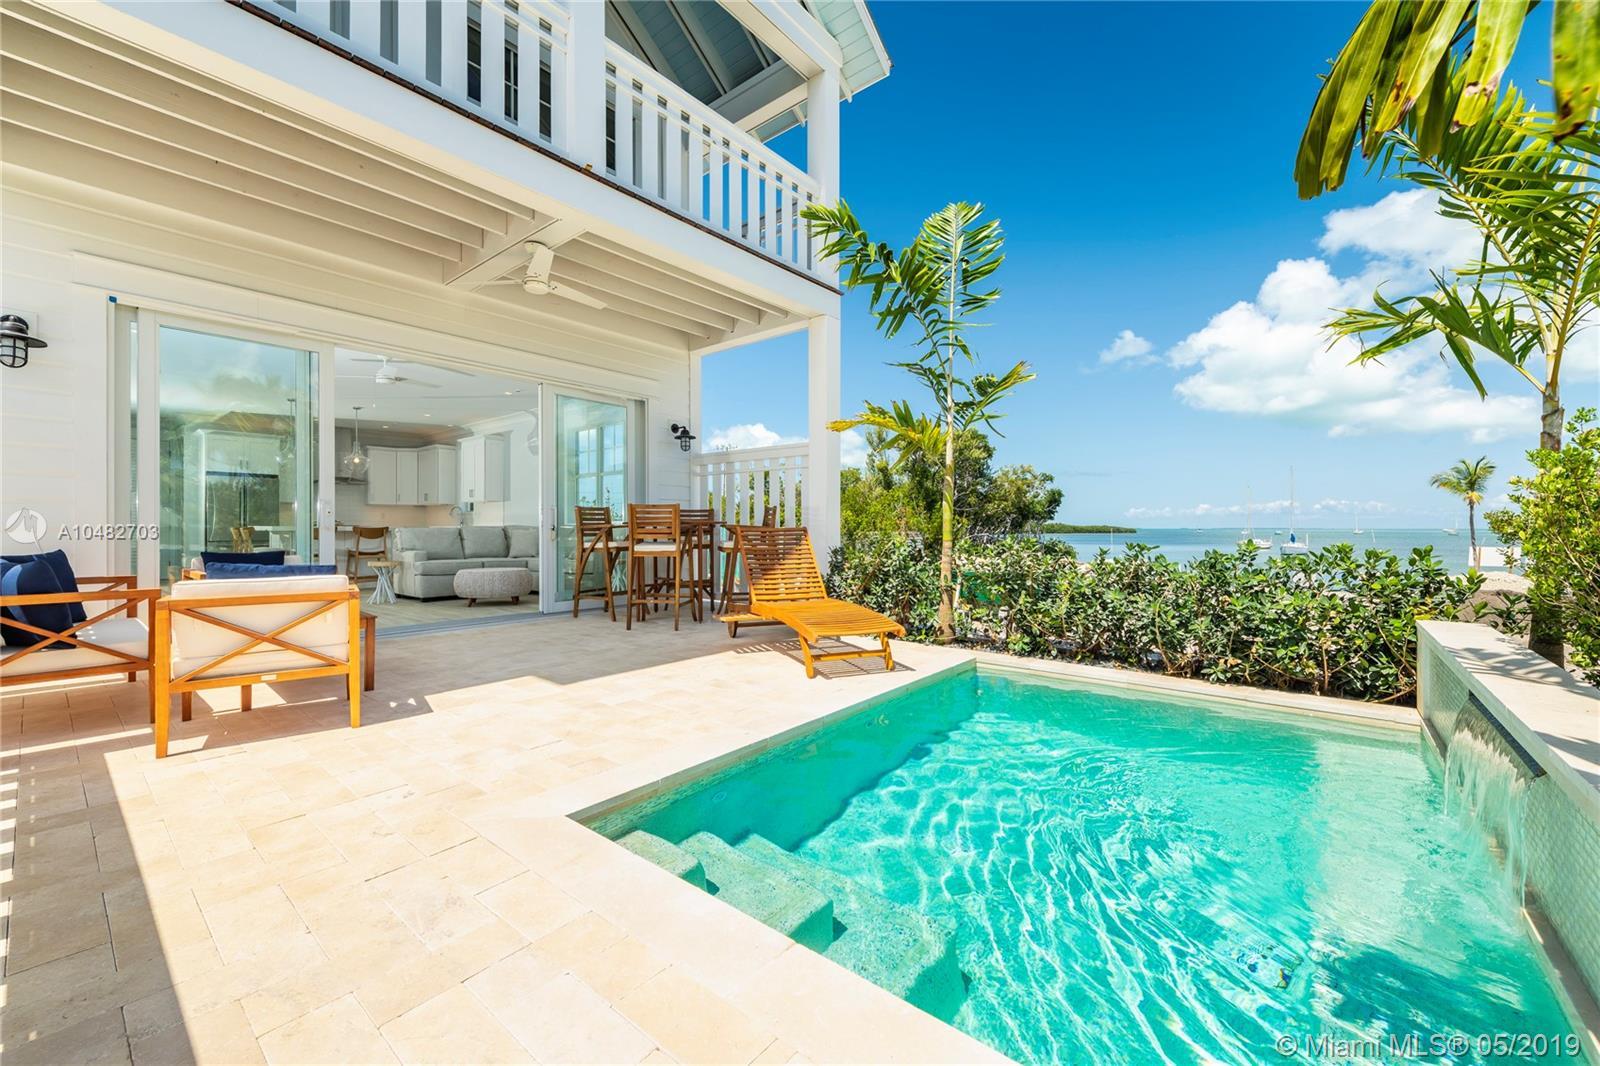 81906 #5 Overseas, Other City - Keys/Islands/Caribbean, FL 33036